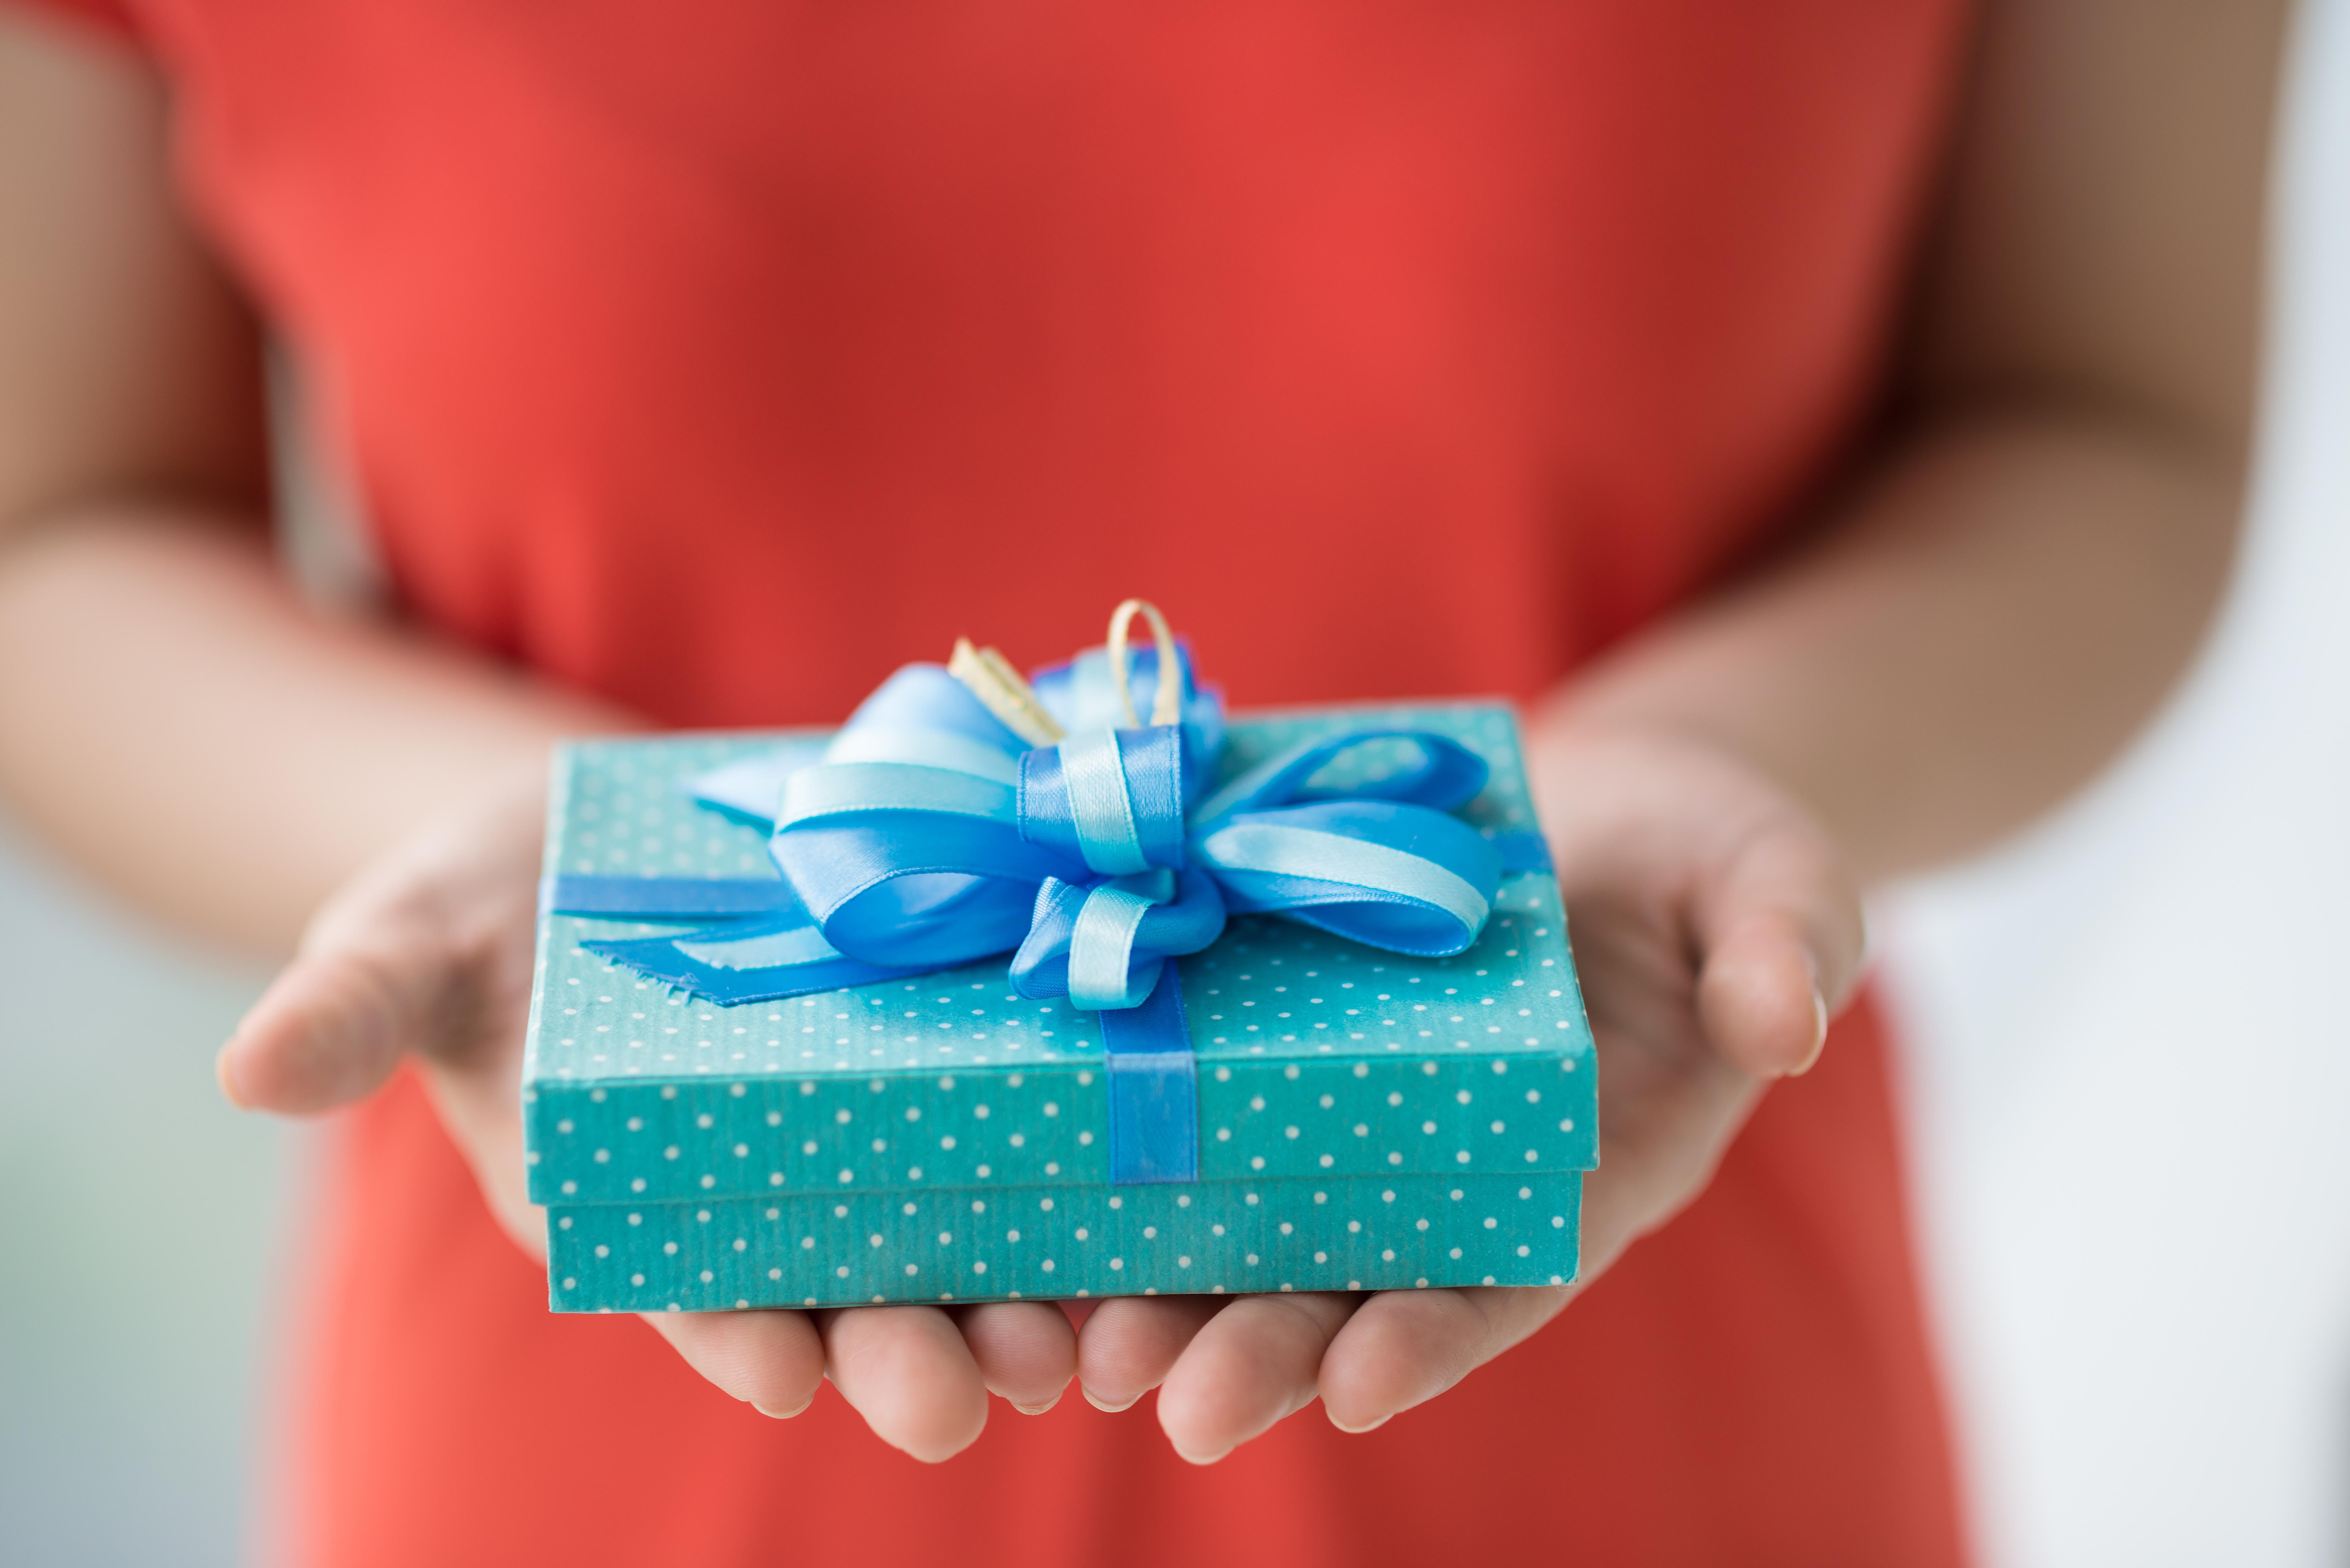 pomysły na prezenty randkowe pary